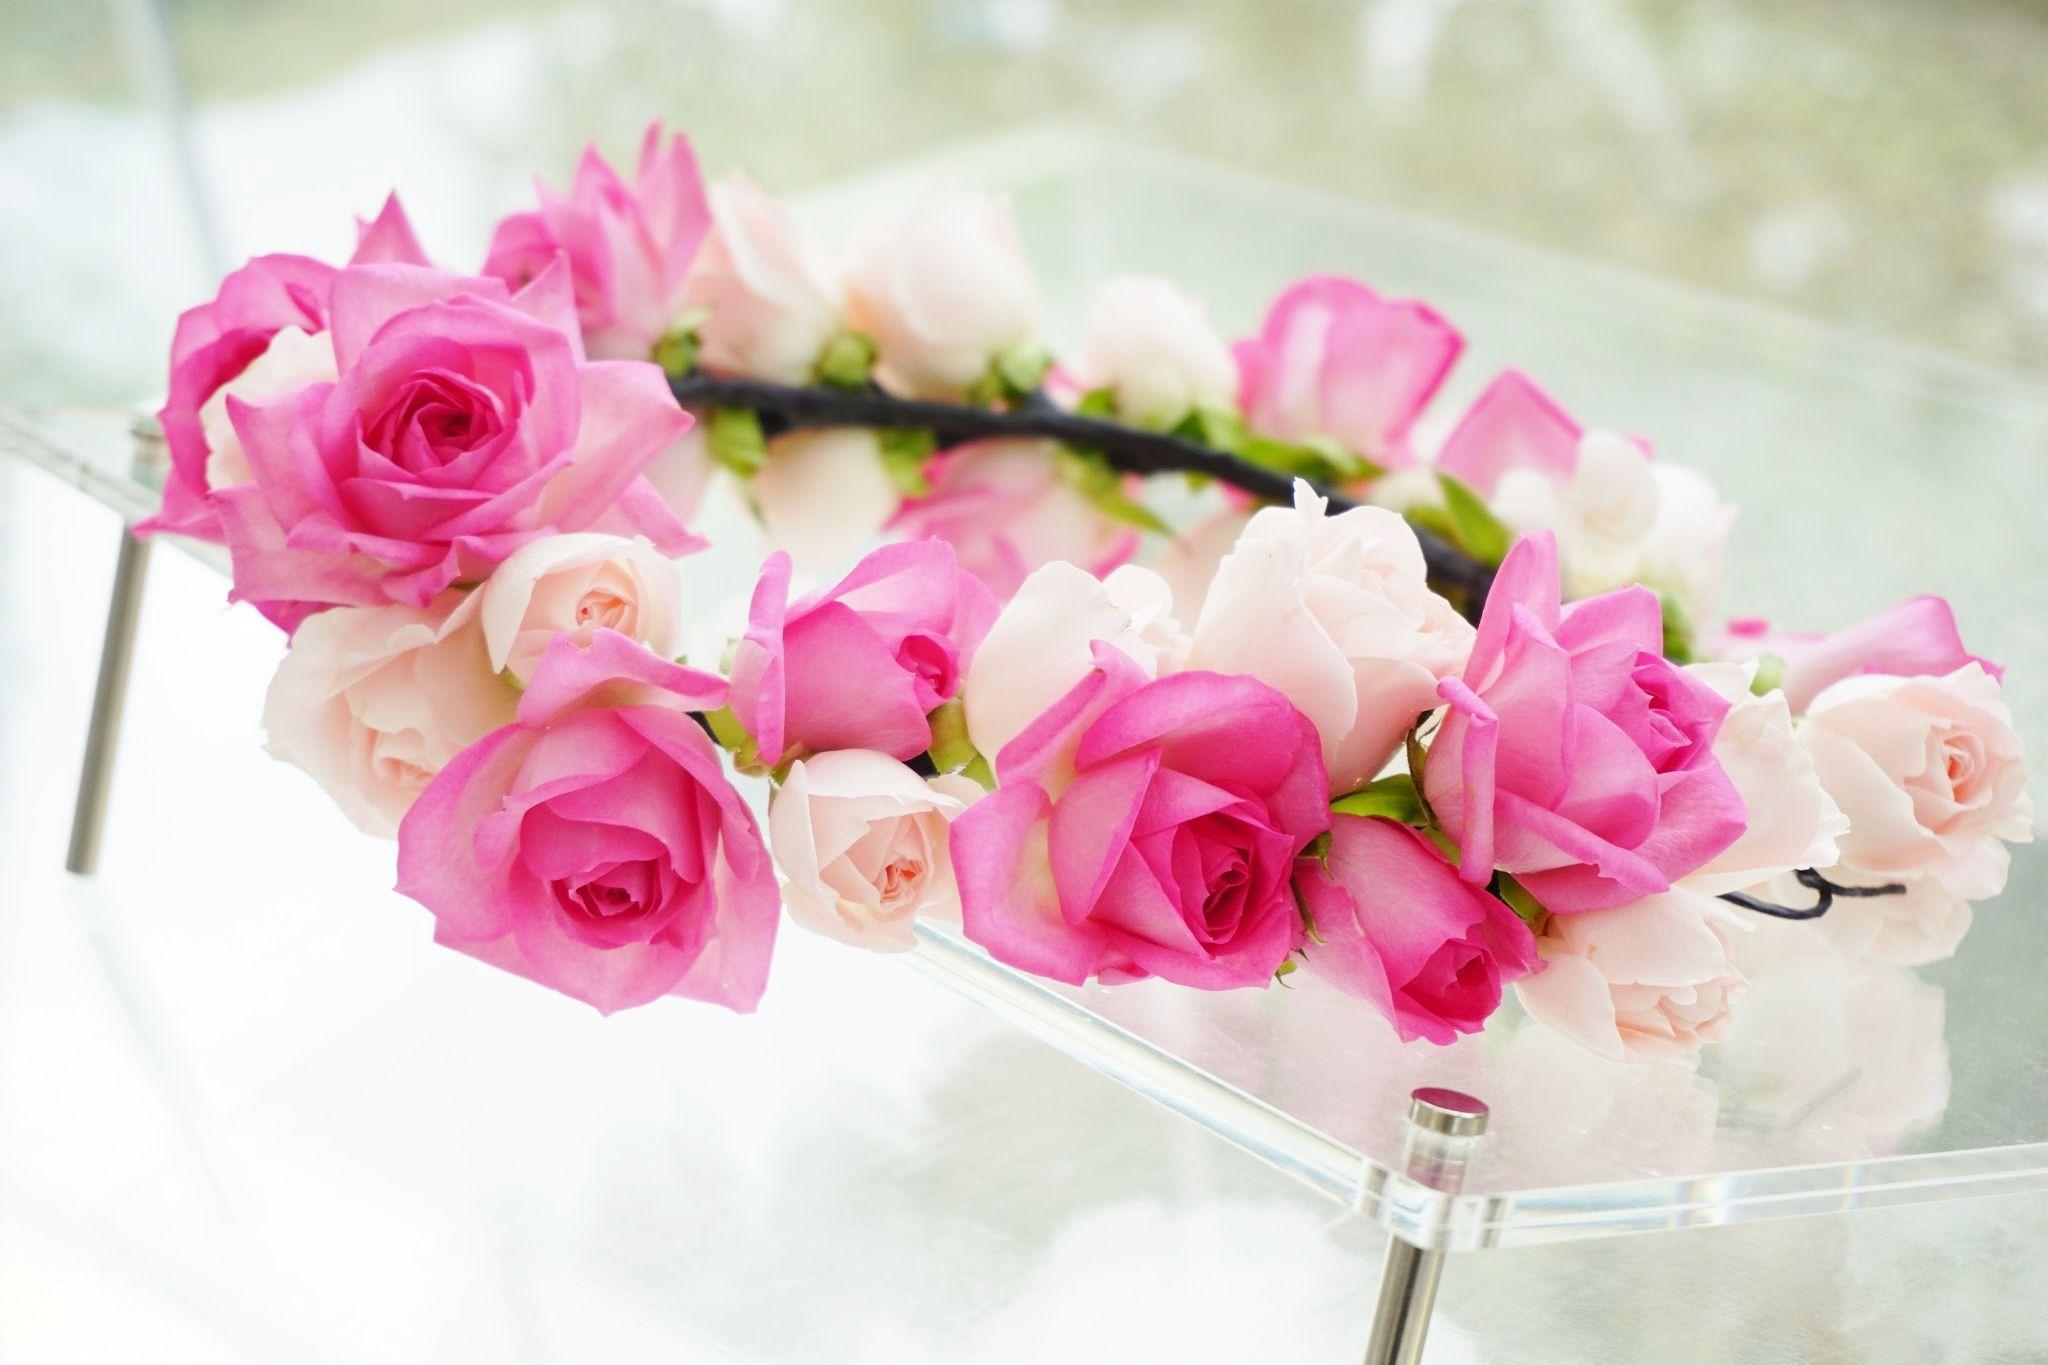 # Vress et Rose # Wedding # pink #smoky pink  # natural # Flower # Bridal # ブレスエットロゼ #ウエディング# ピンク #スモーキーピンク #シンプル # 花冠り #リストレット# ナチュラル# 花 バラ# ブライダル#結婚式